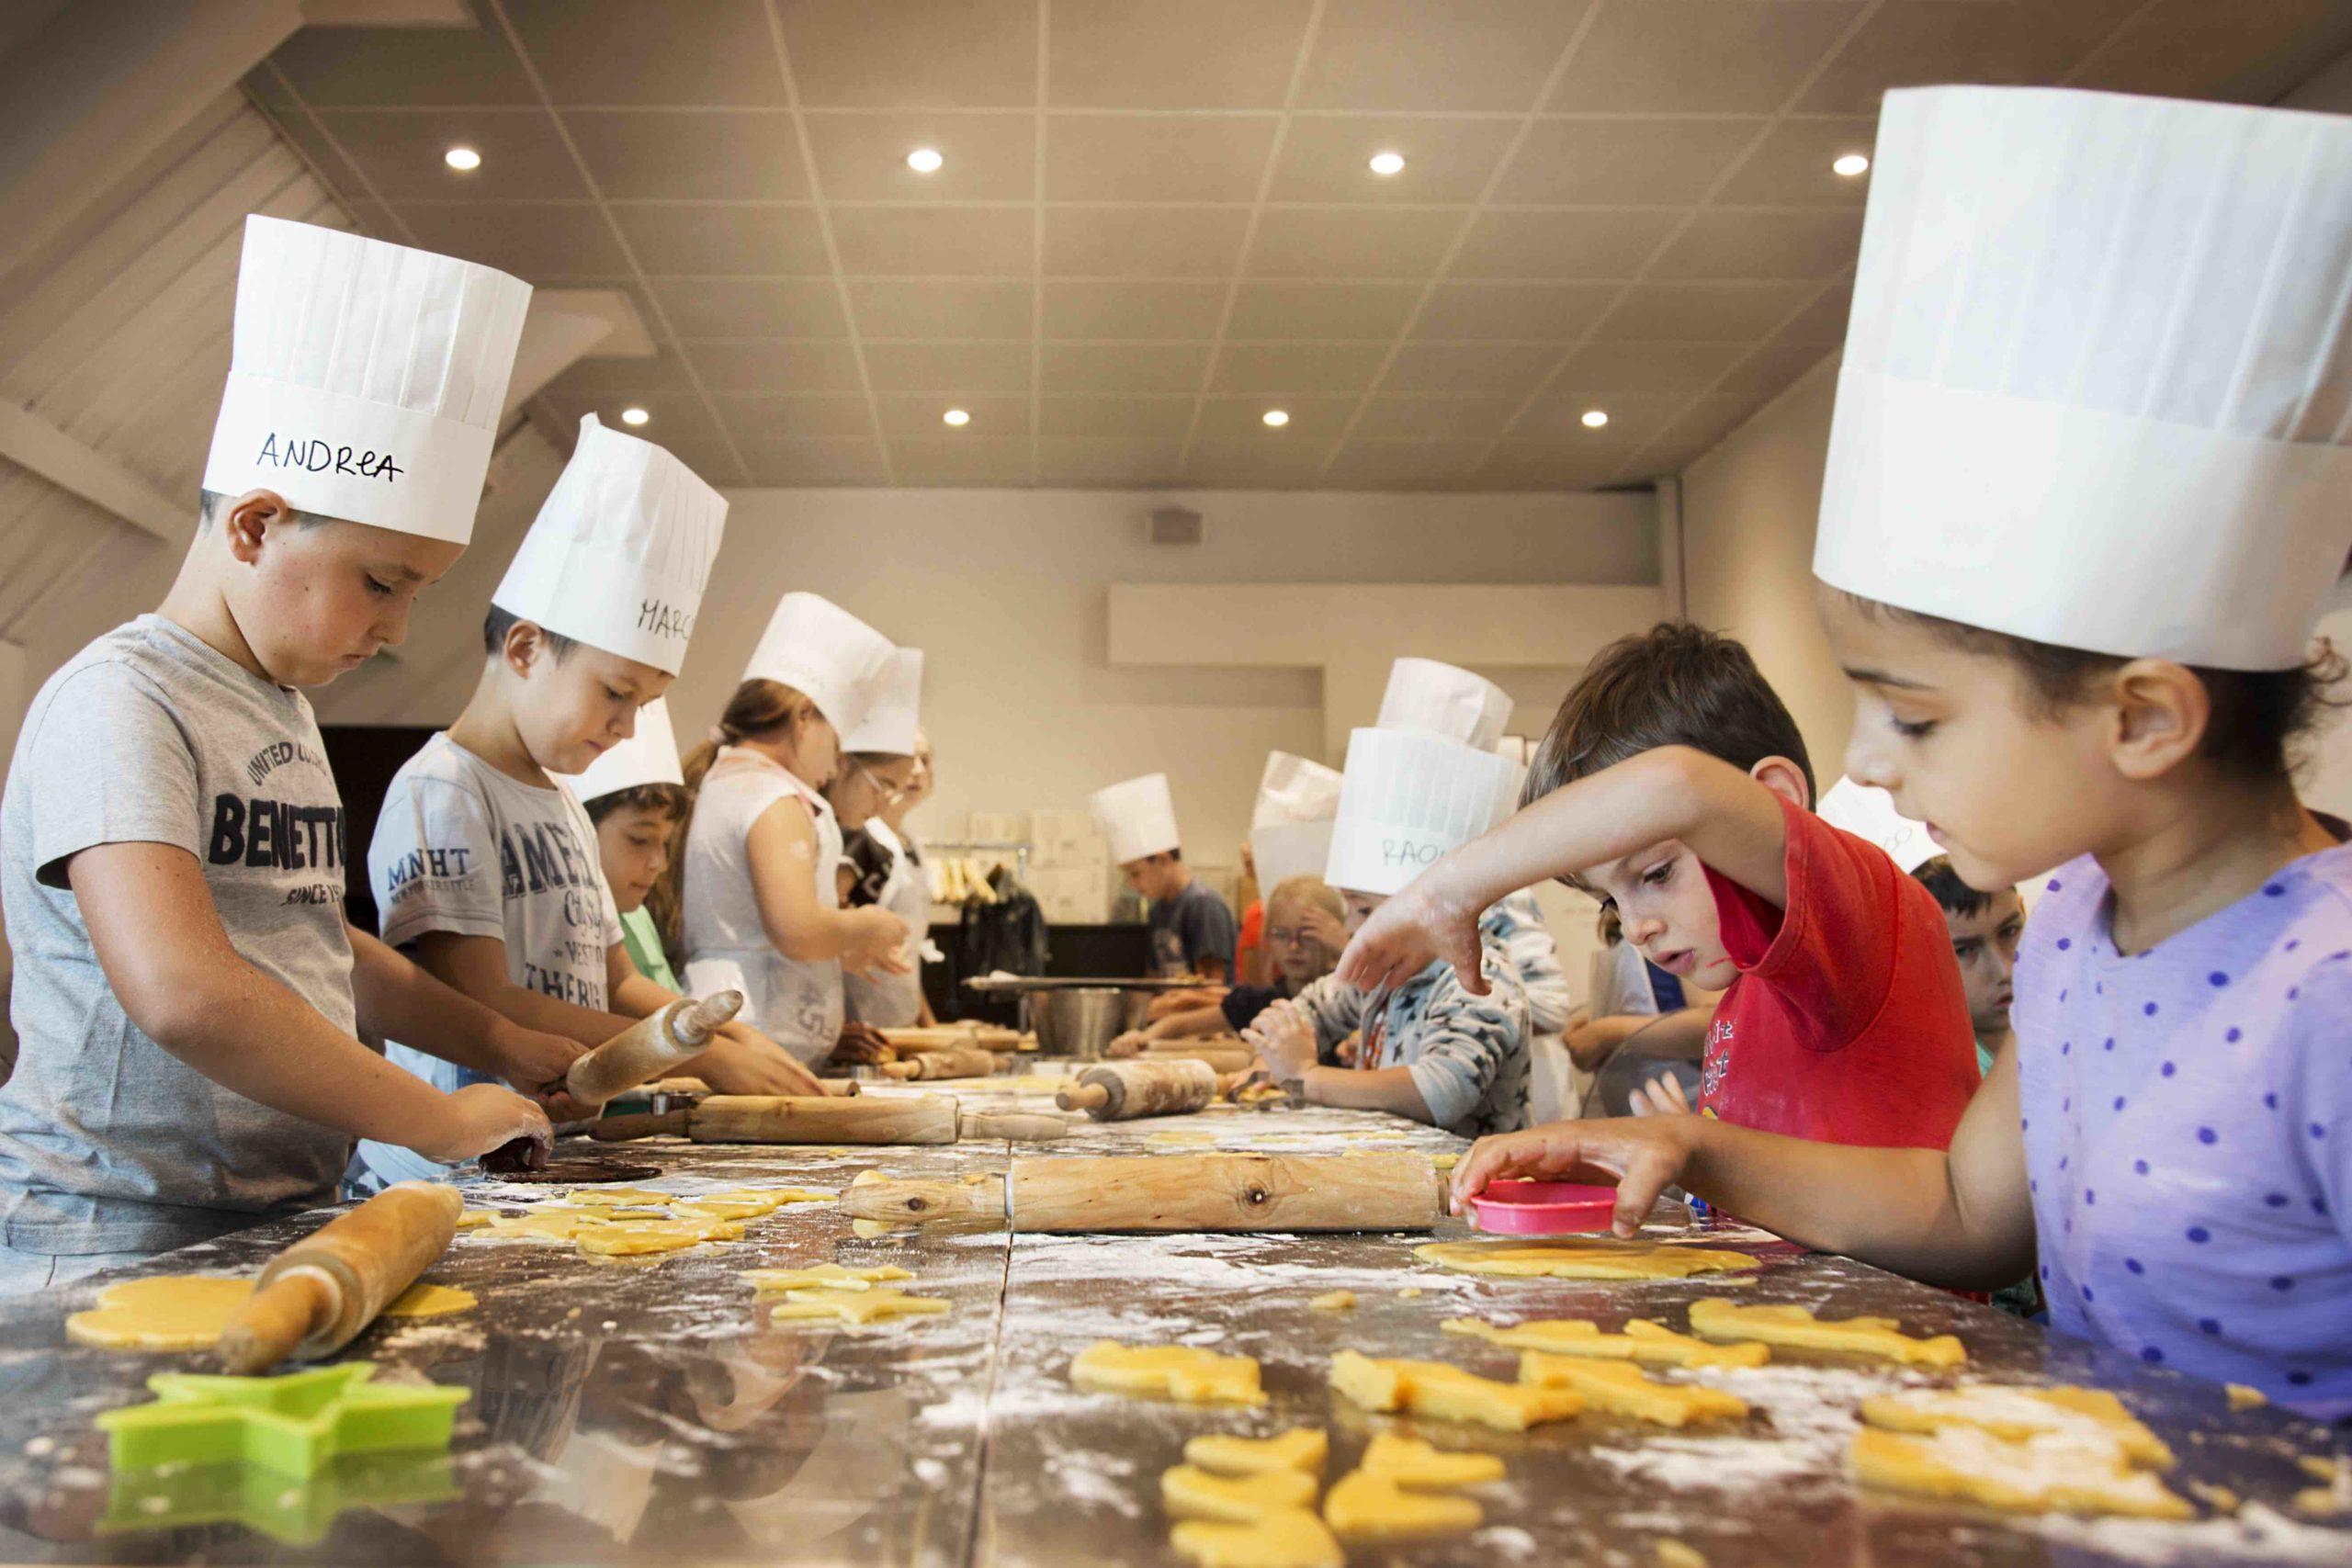 Da Eataly Lingotto a luglio, centro estivo per bimbi a Torino